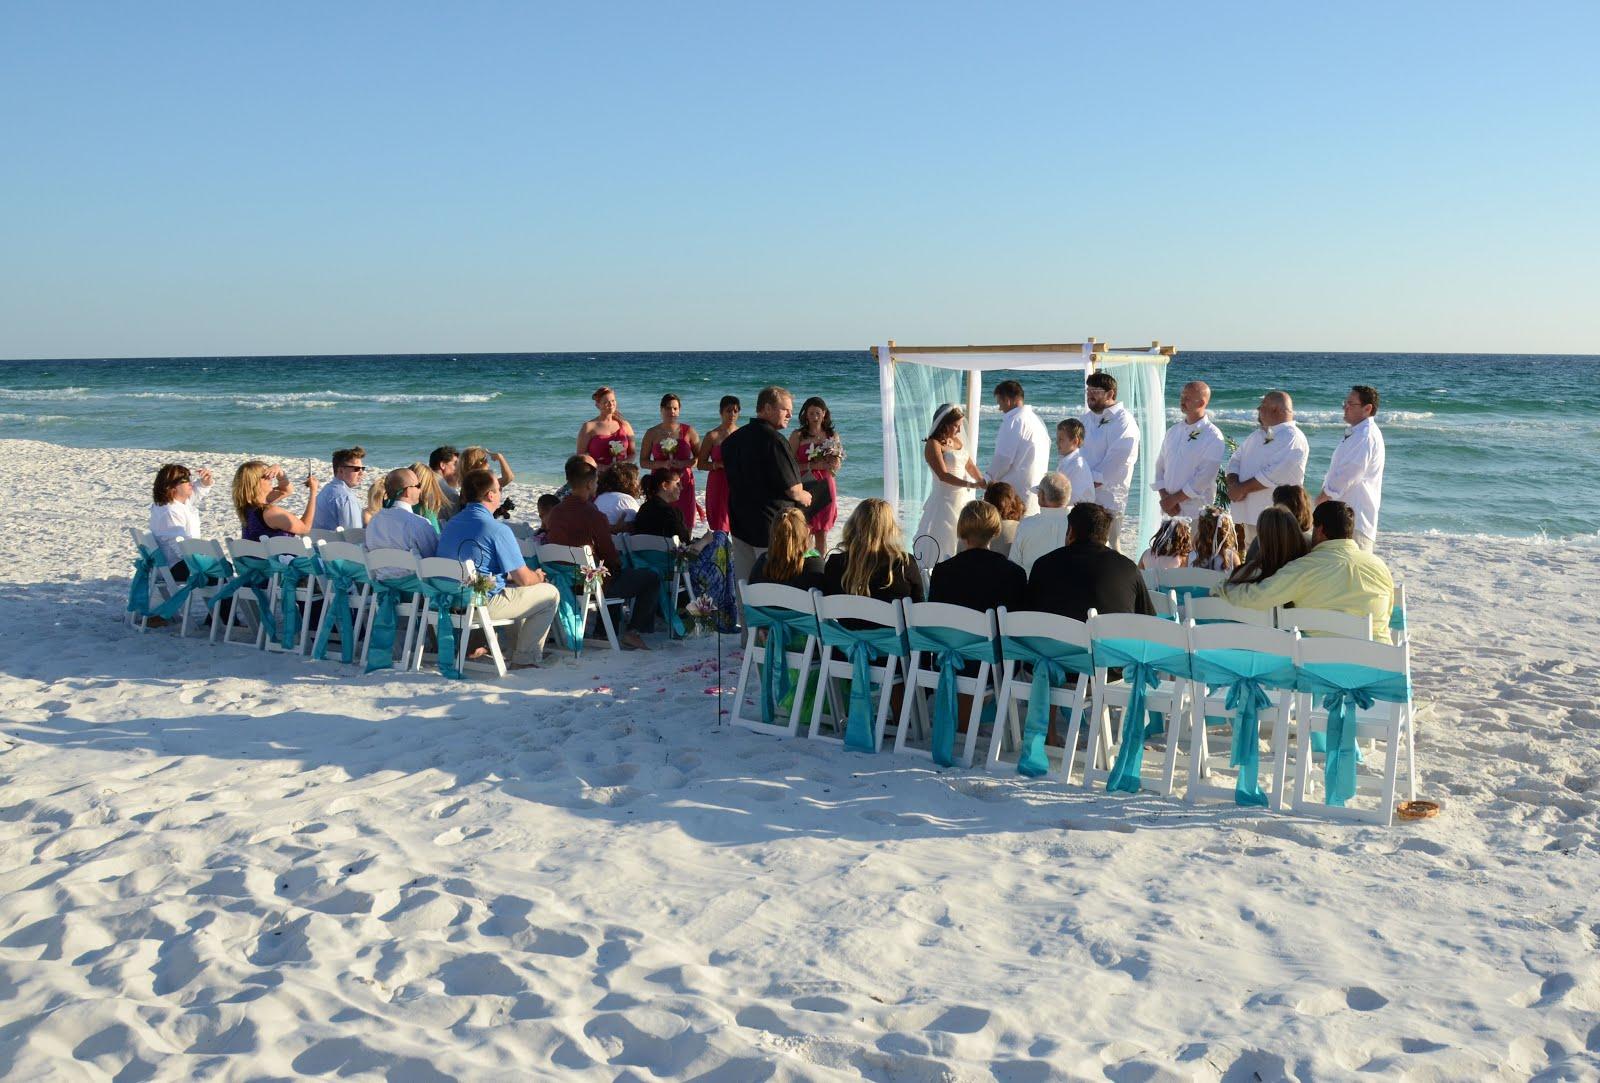 Beach weddings fort walton beach wedding packages sunset beach - A Tip Steps To Take To Plan A Florida Destination Beach Wedding